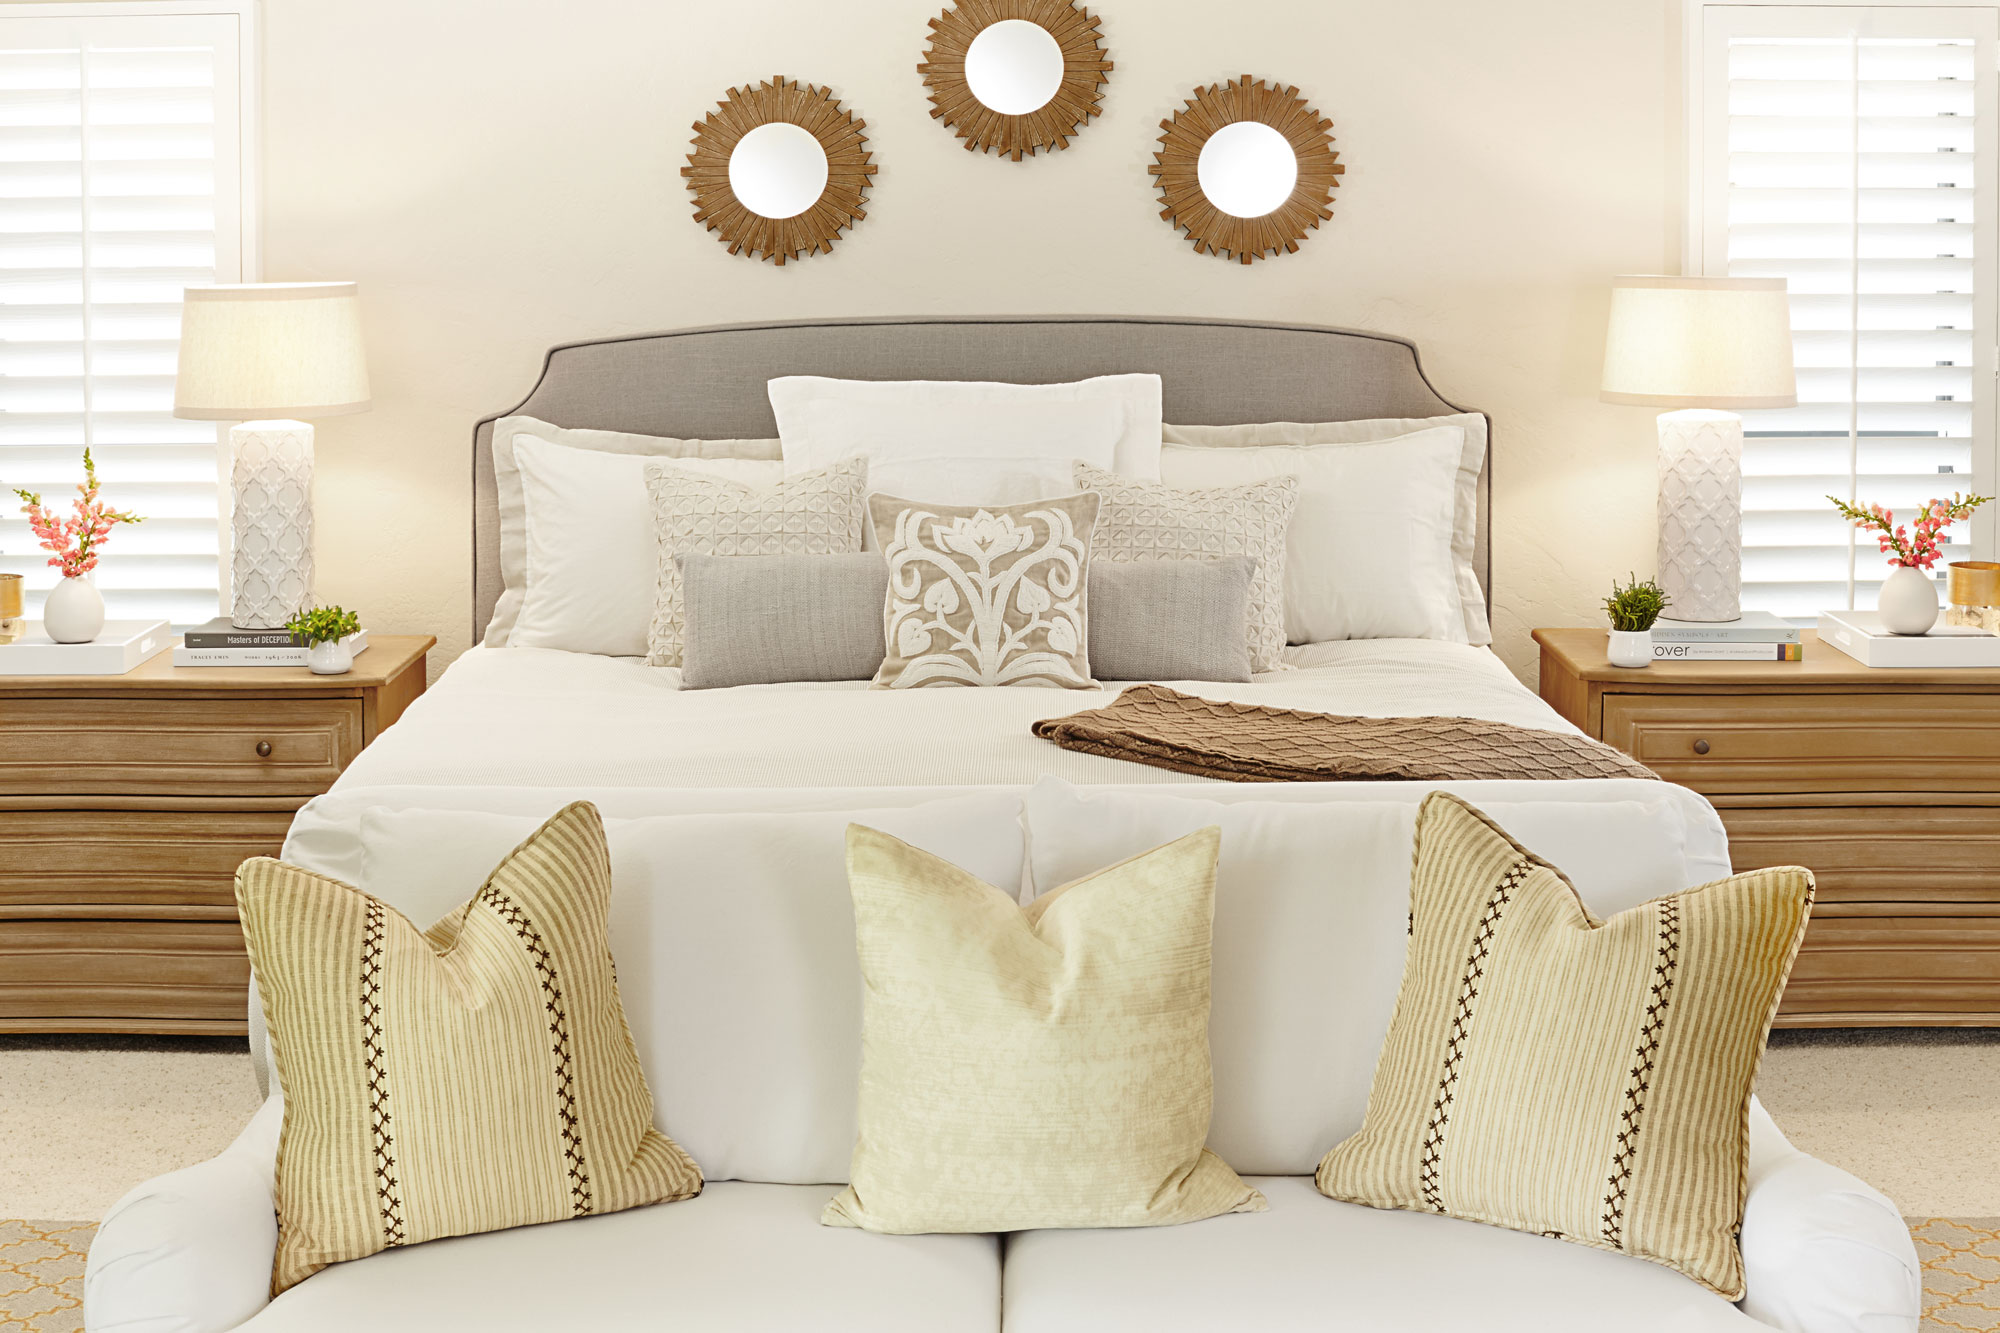 lygia-harkins-interiors-north-central-master-bedroom-2000pxW.jpg